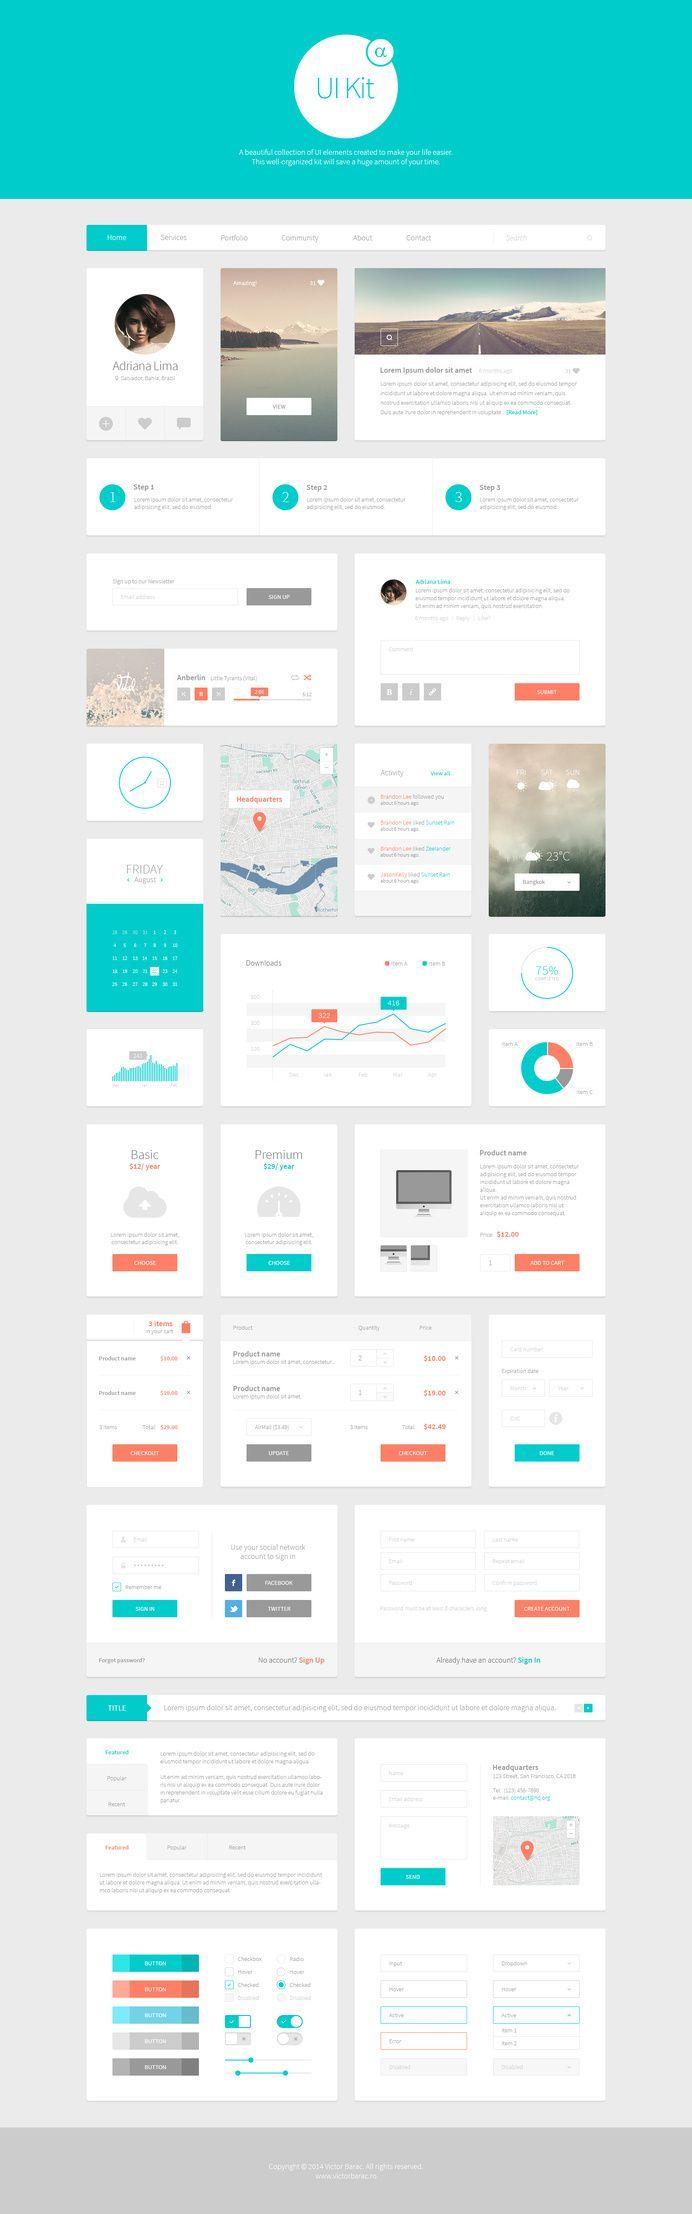 Alpha UI Kit Web Elements 1 in Dashboard